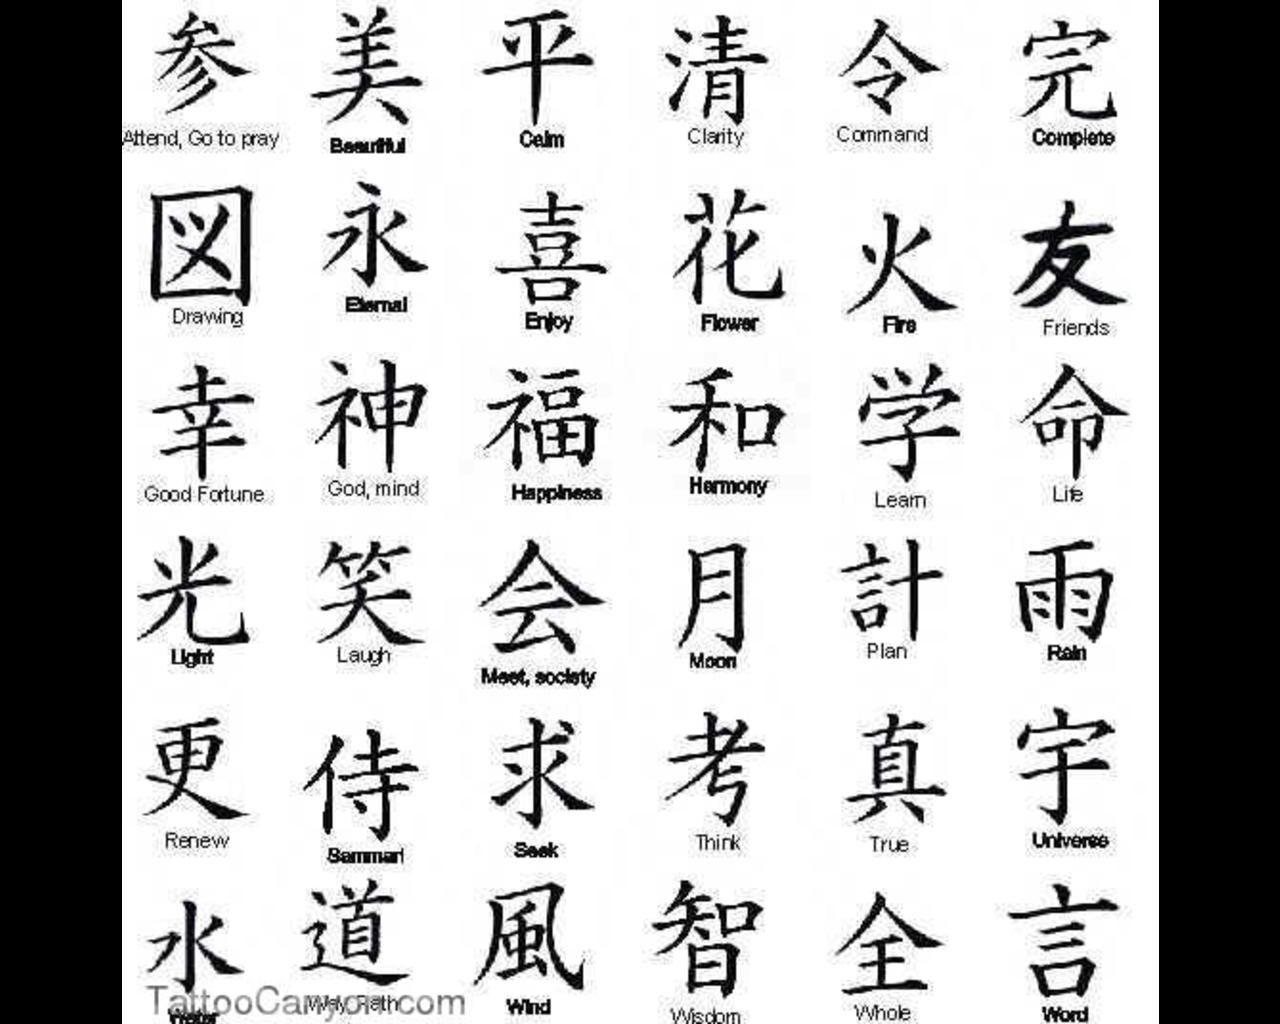 Japanese Symbols Japanese Tattoo Symbols Kanji Tattoo Chinese Symbol Tattoos